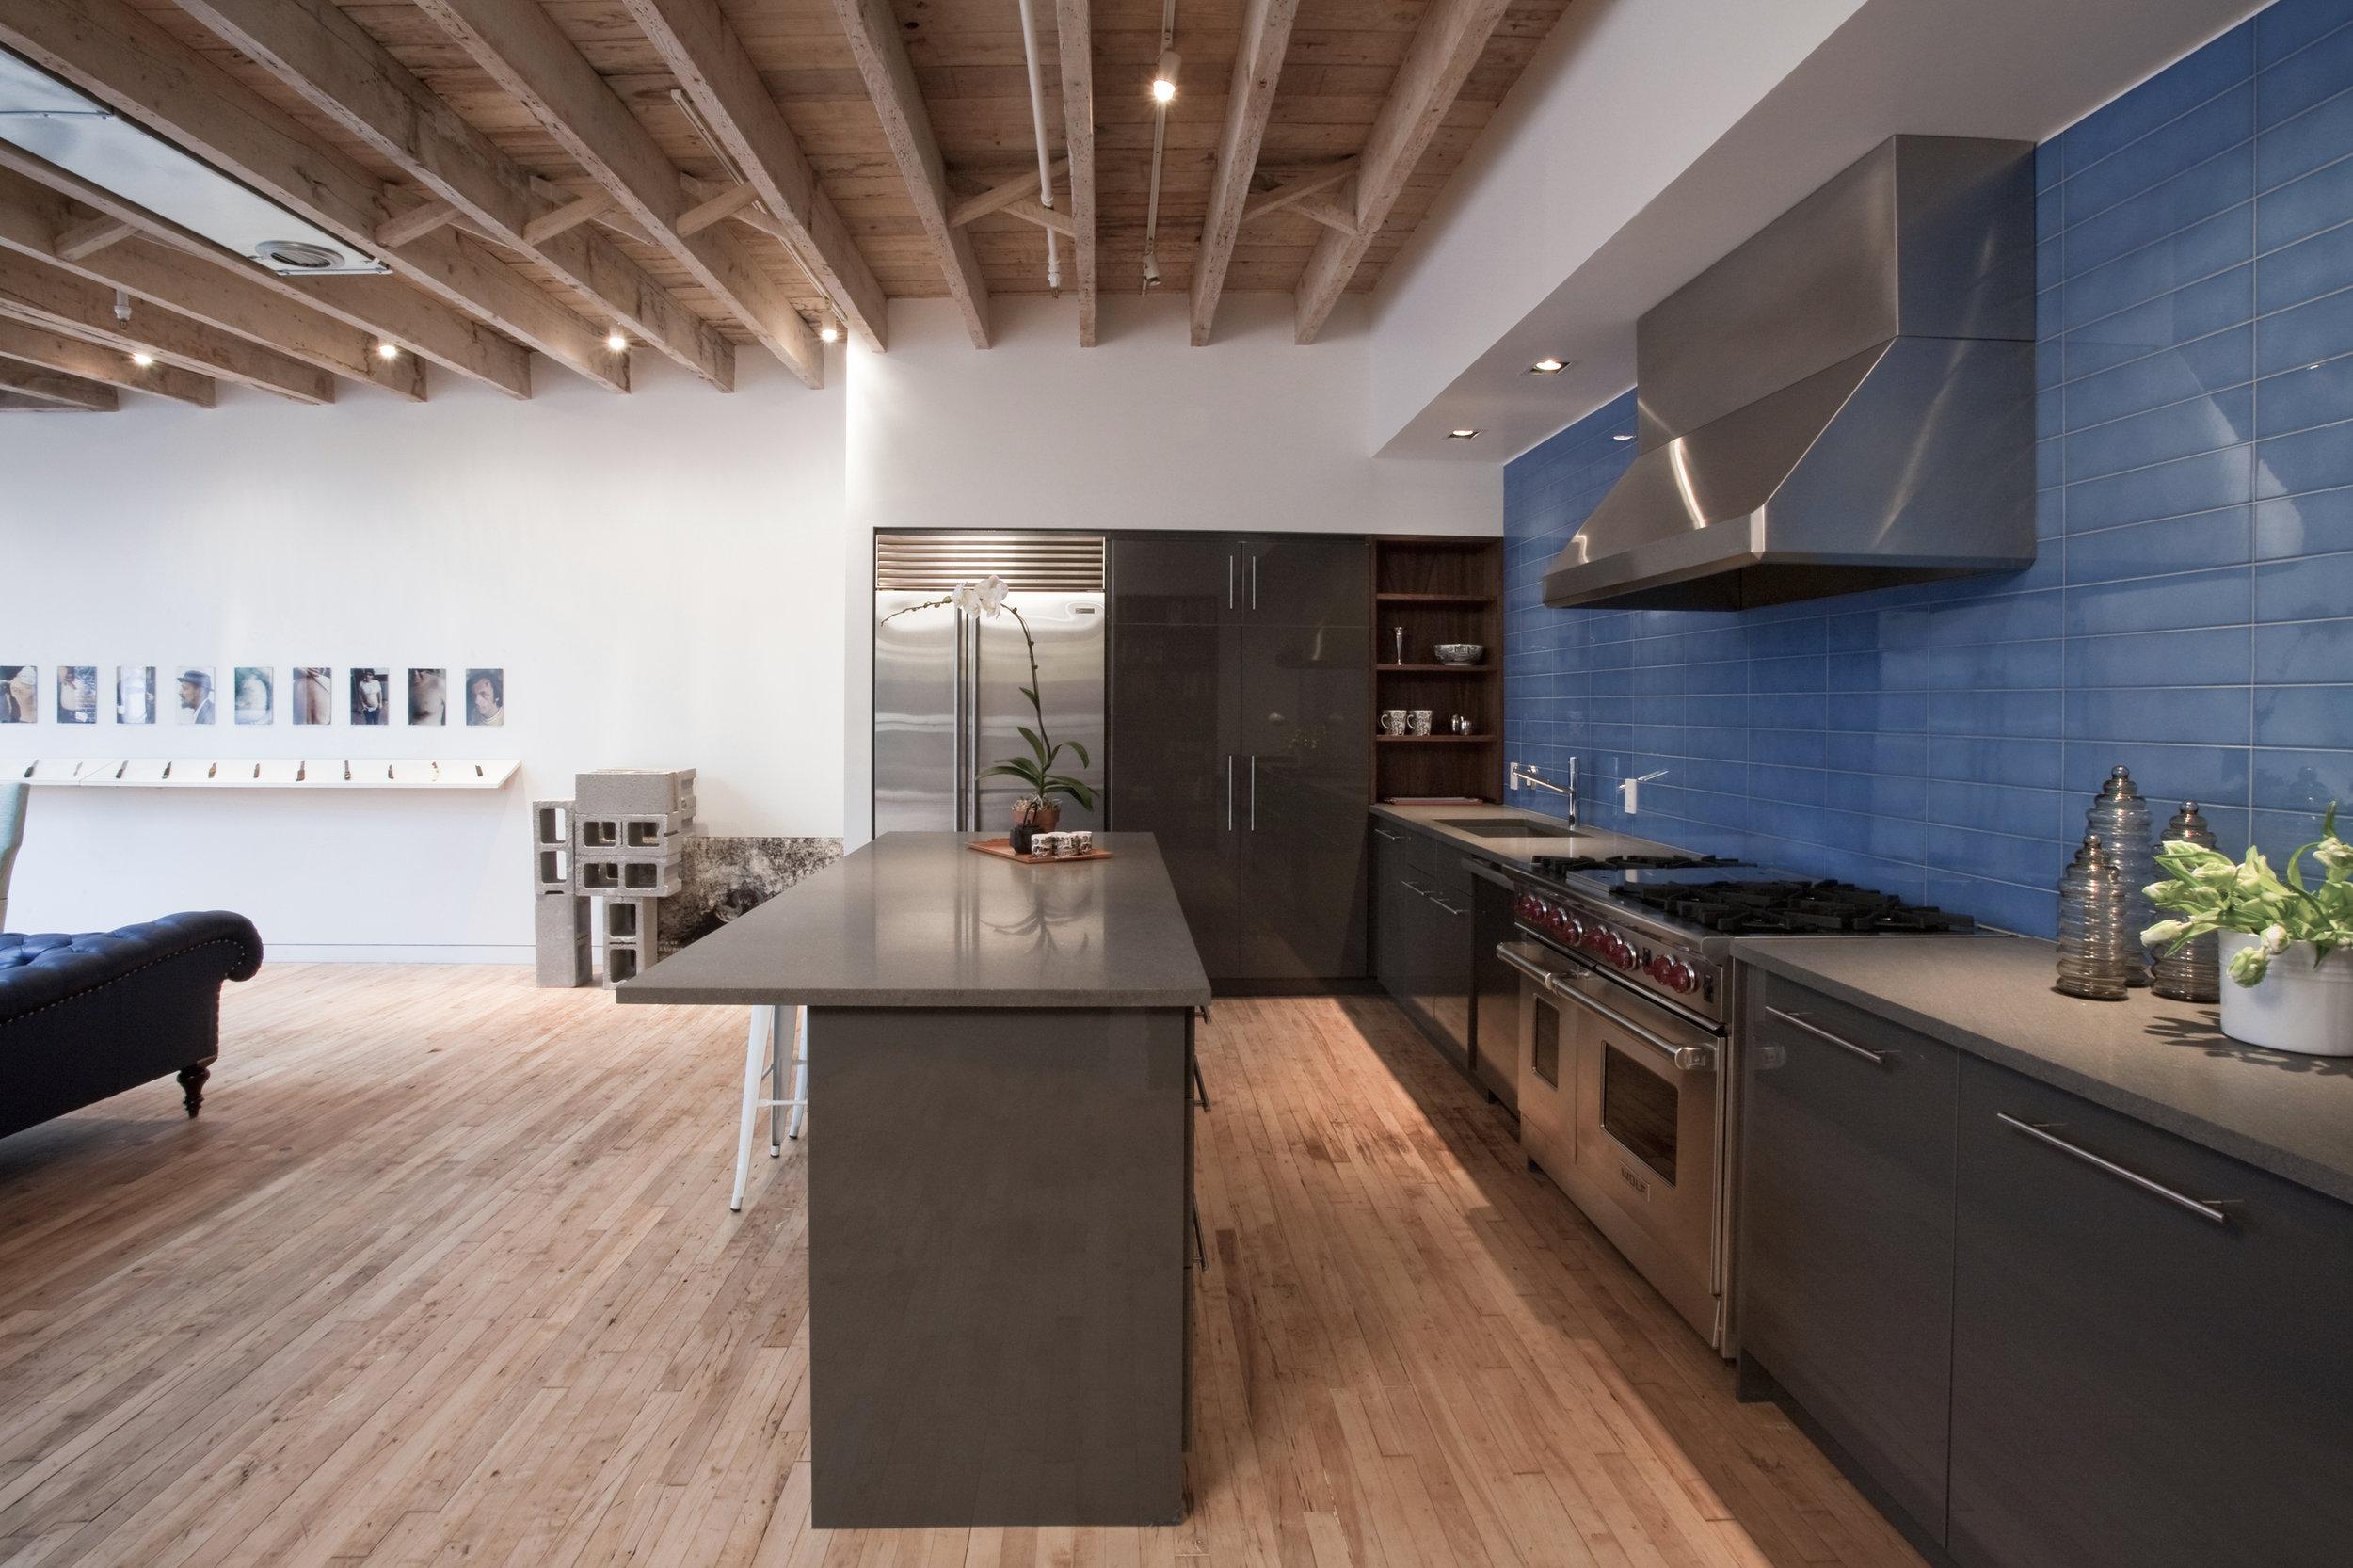 Kitchen facing Refrigerator.jpg